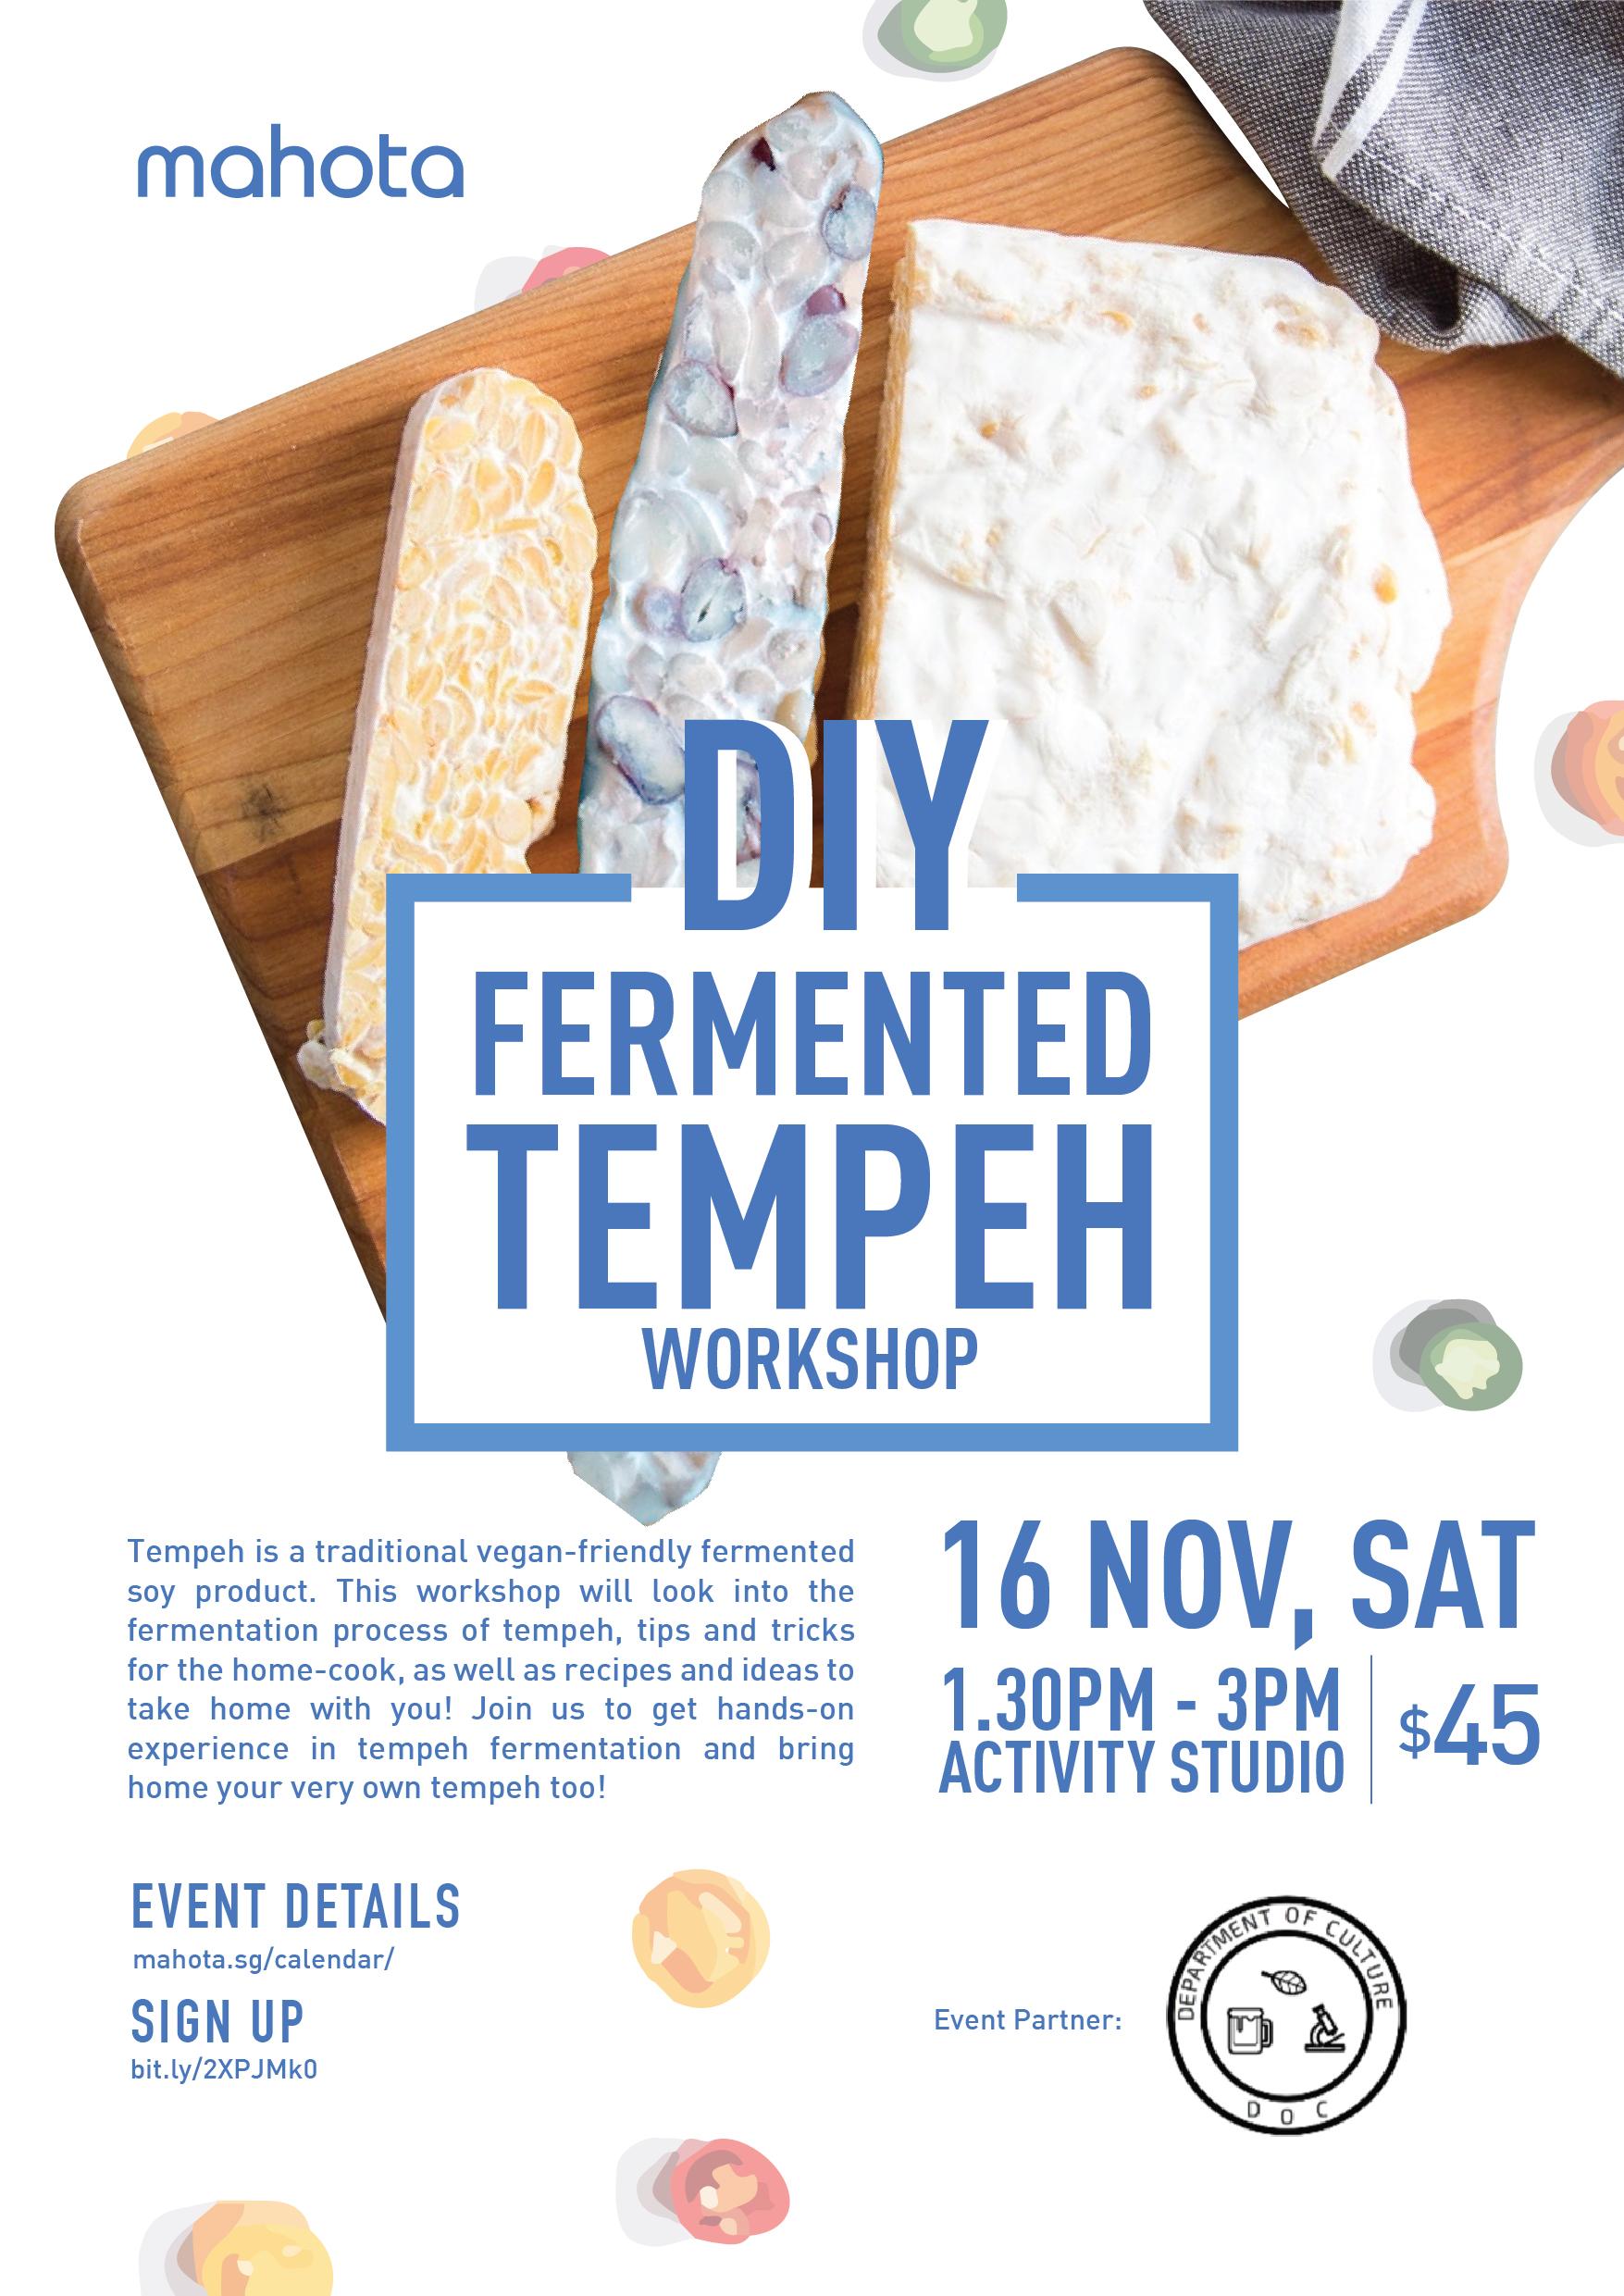 diy-fermented-tempeh-workshop